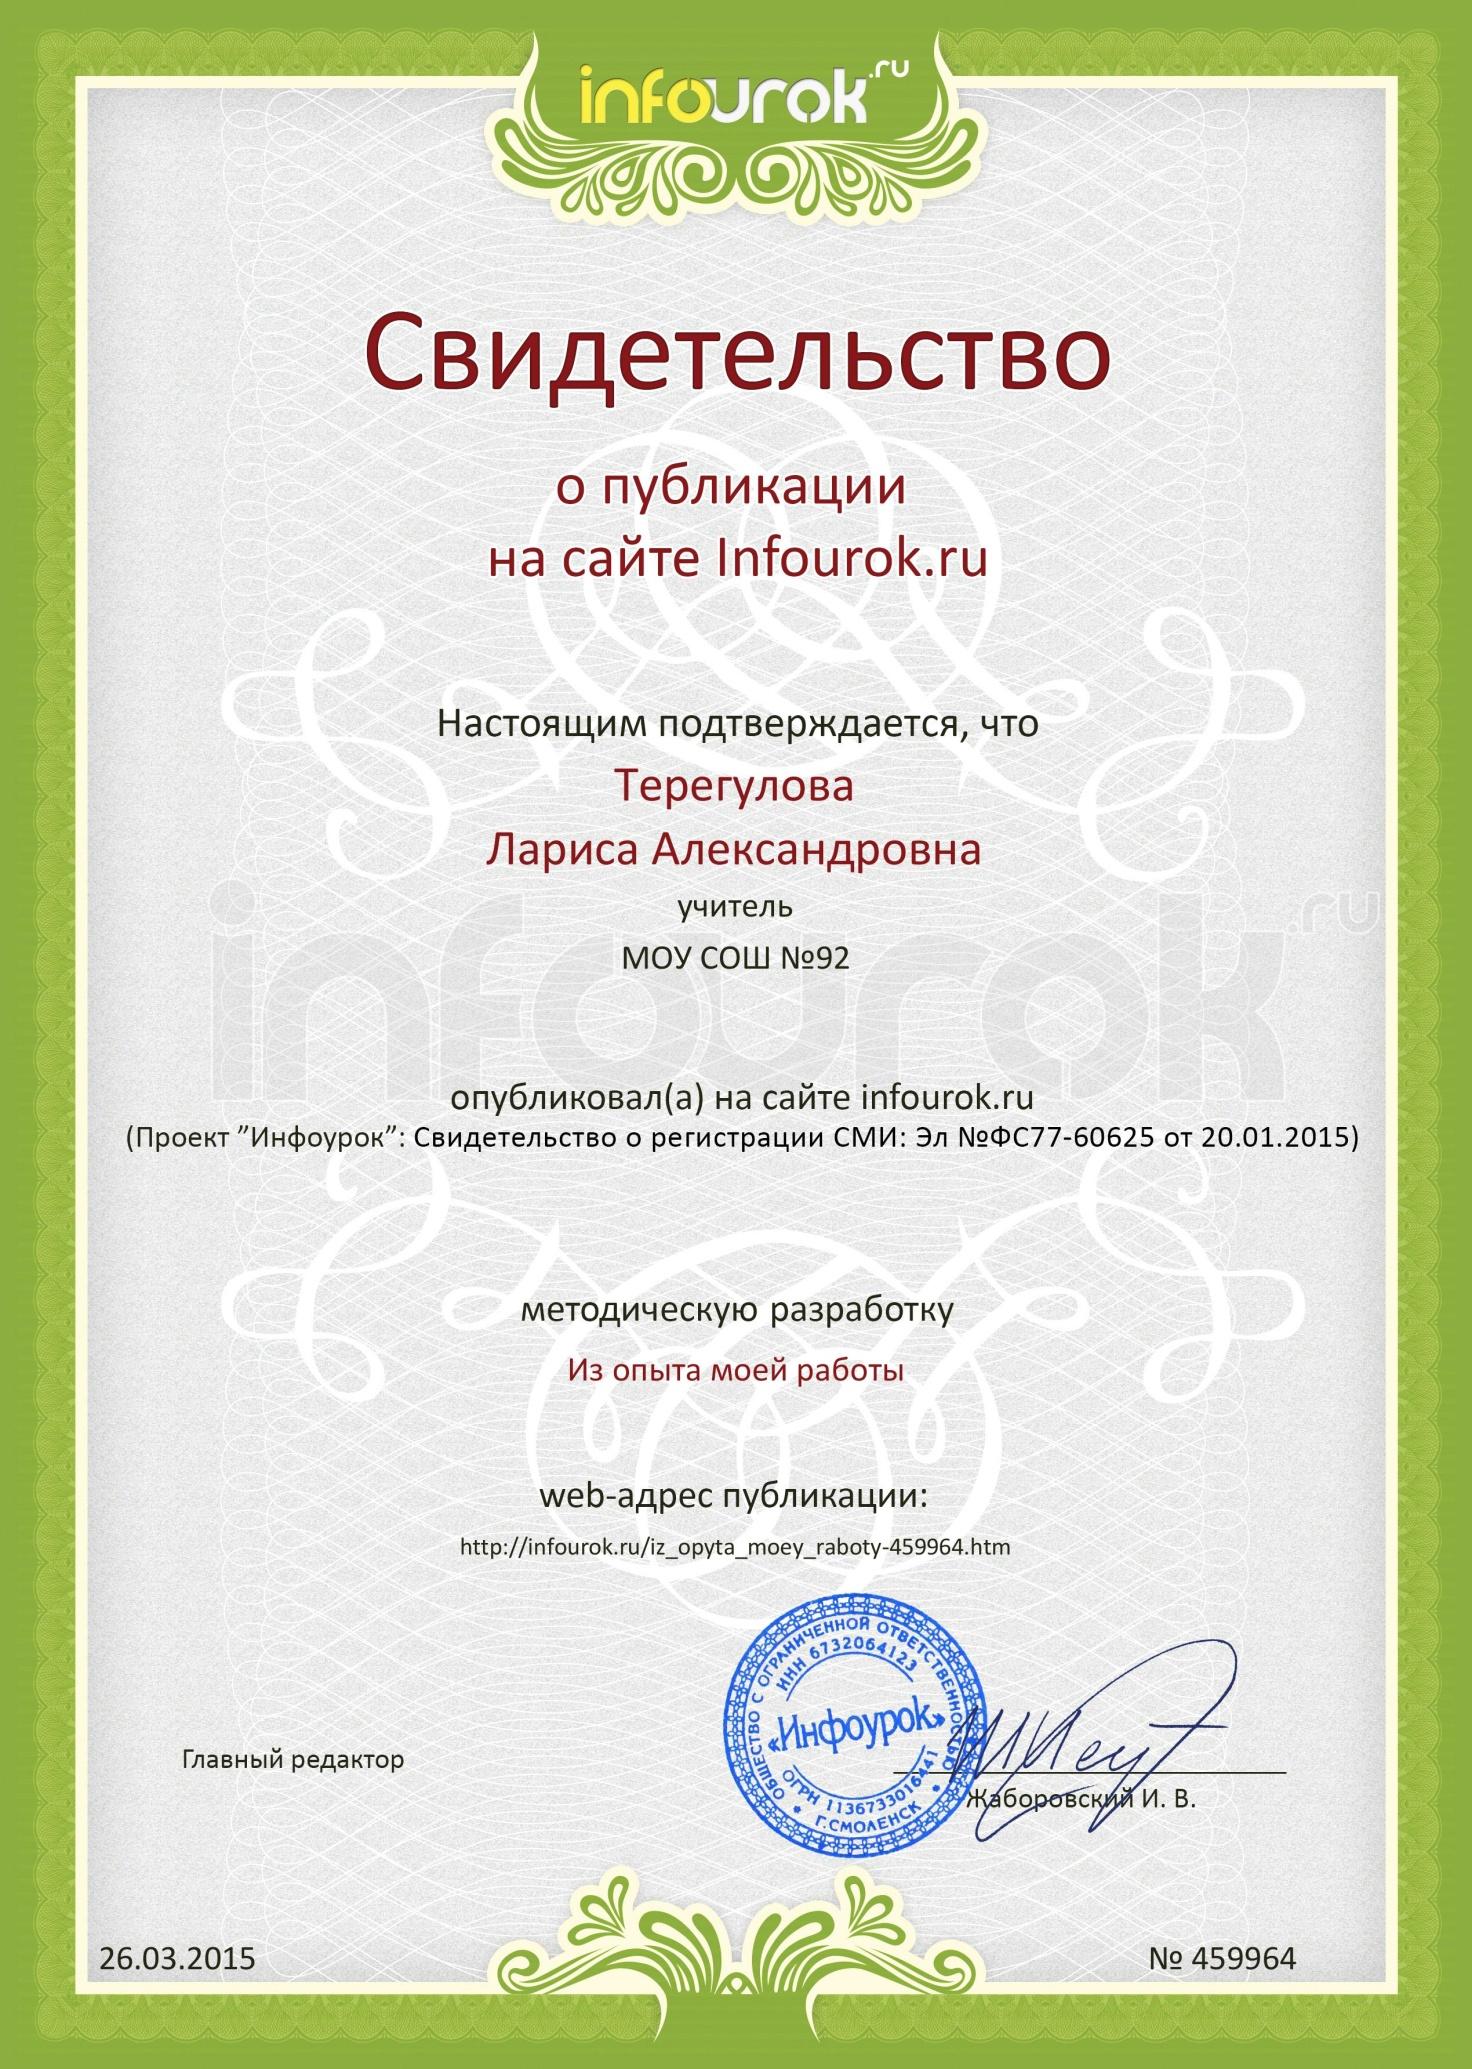 Сертификат проекта infourok.ru № 459964.jpg